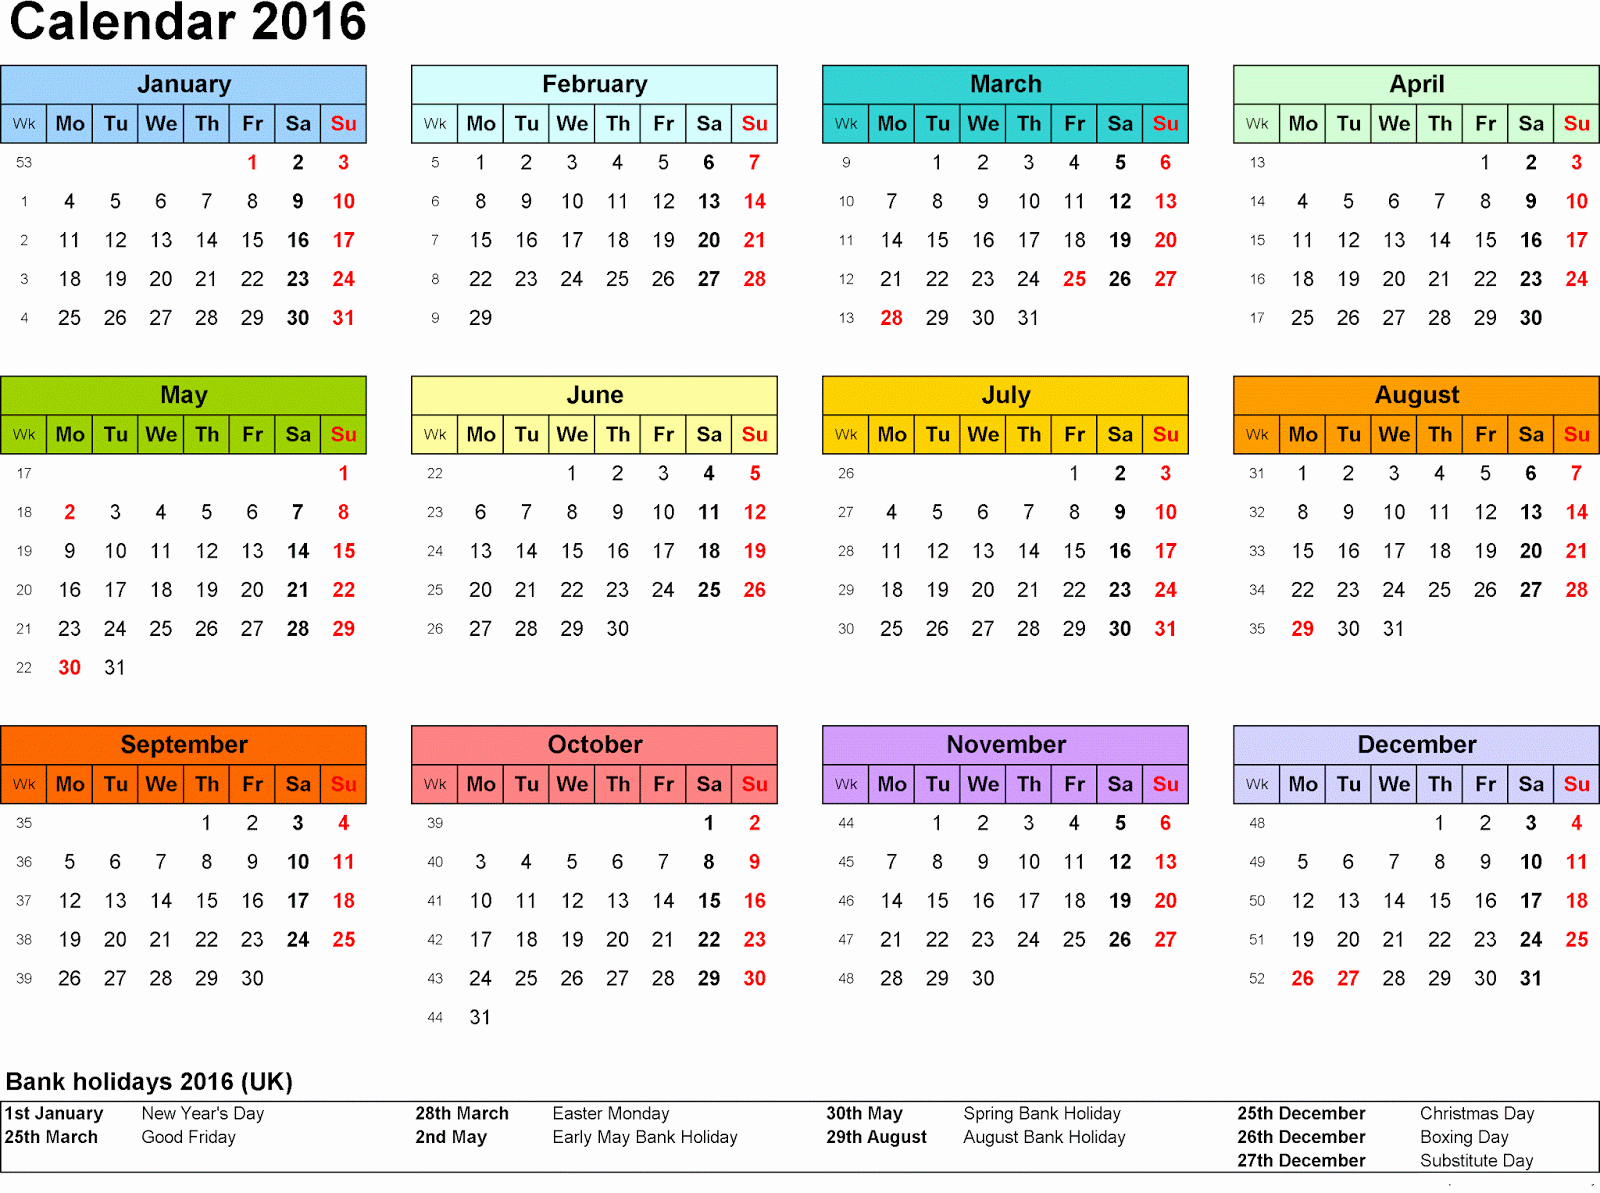 Free Downloadable 2016 Calendar Template Fresh [free] Printable Calendar Templates 2016